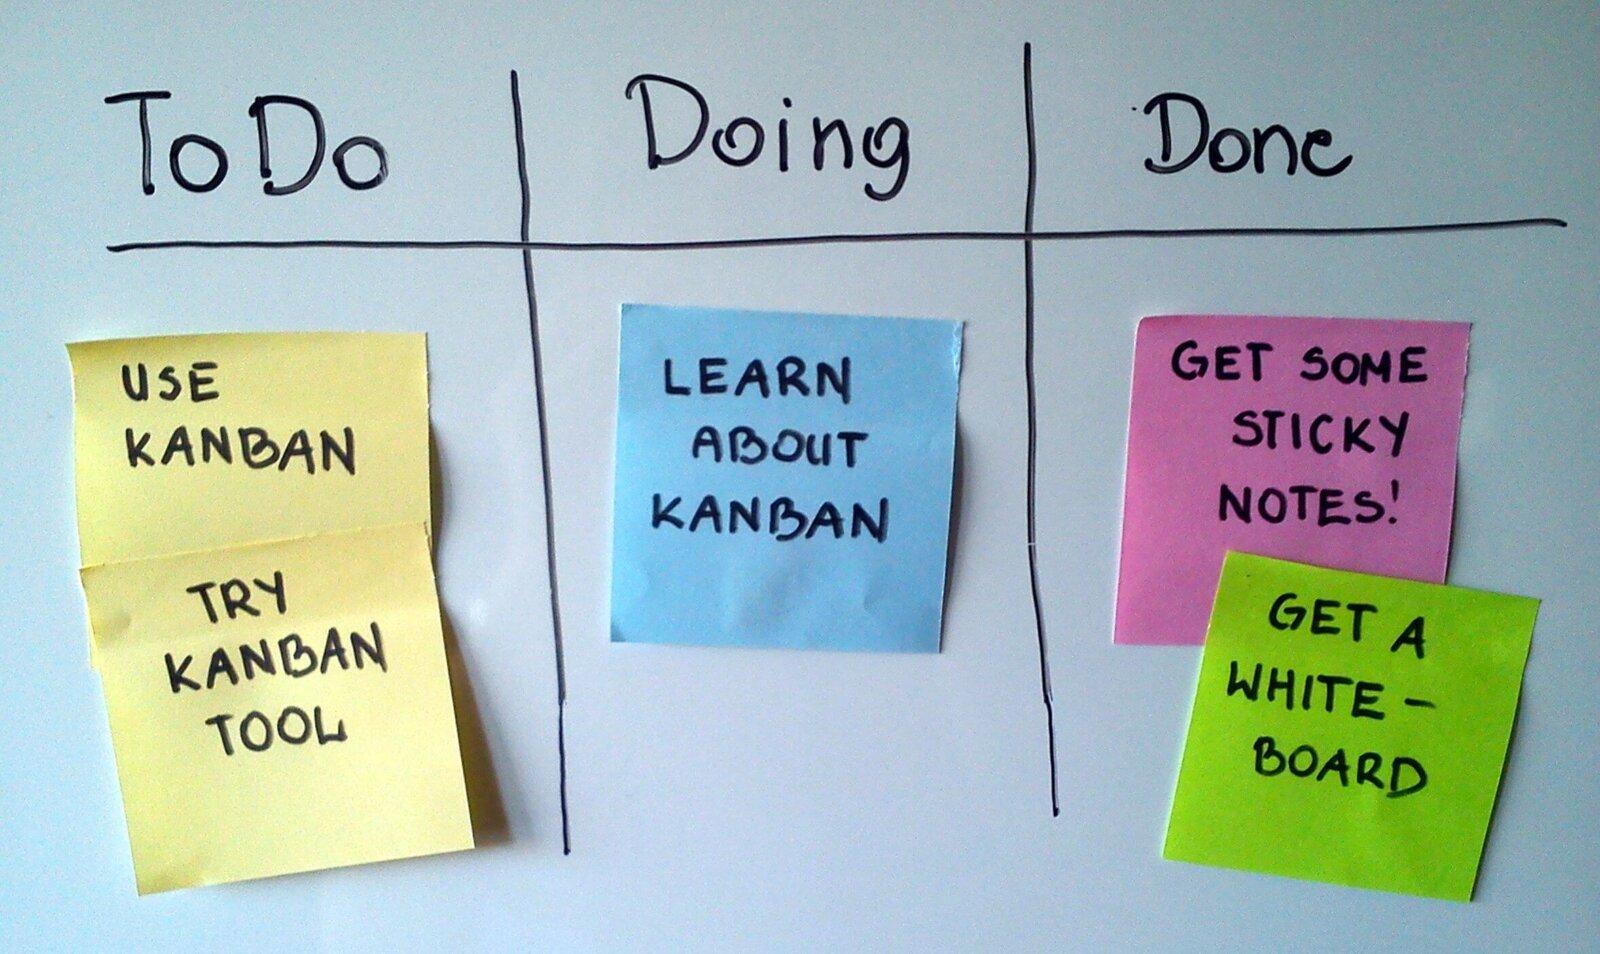 Метод канбан тайм-менеджмент